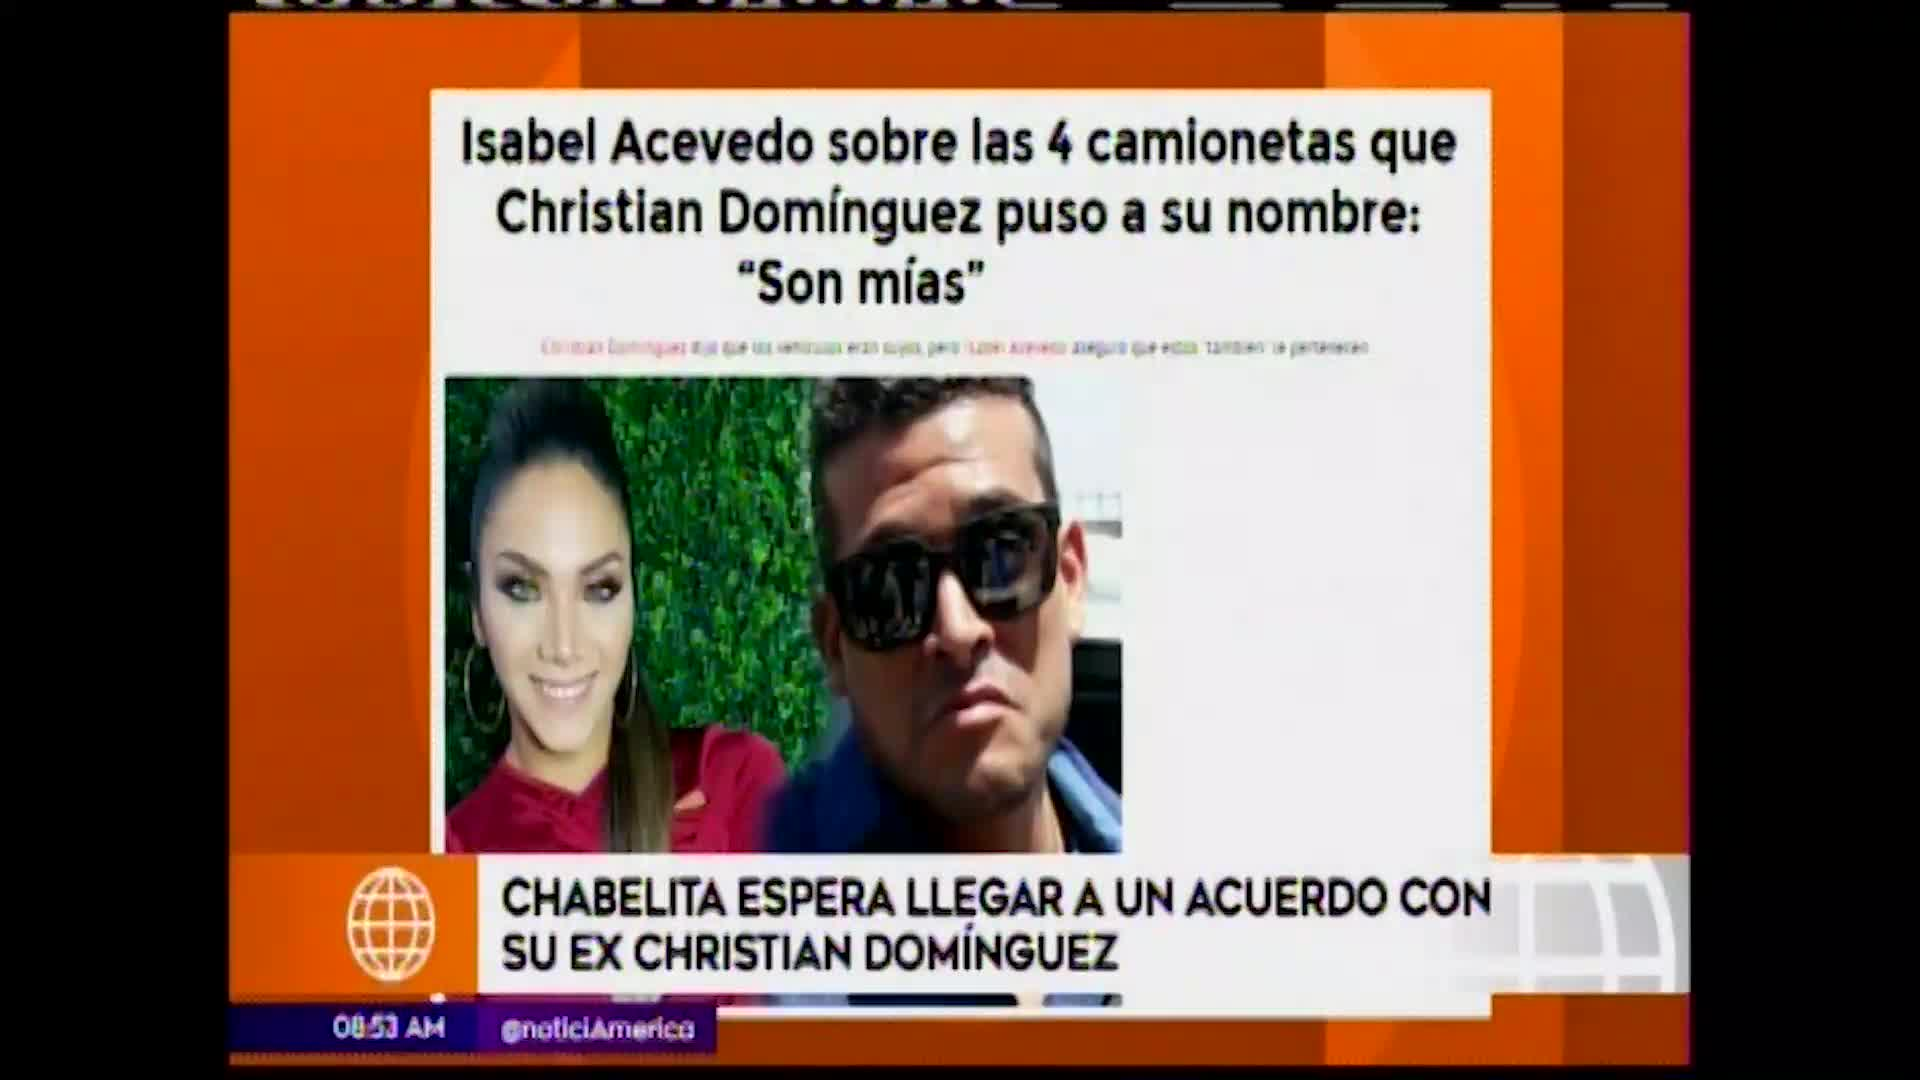 EBT: Isabel Acevedo aclara que aún tiene temas legales con Christian Domínguez